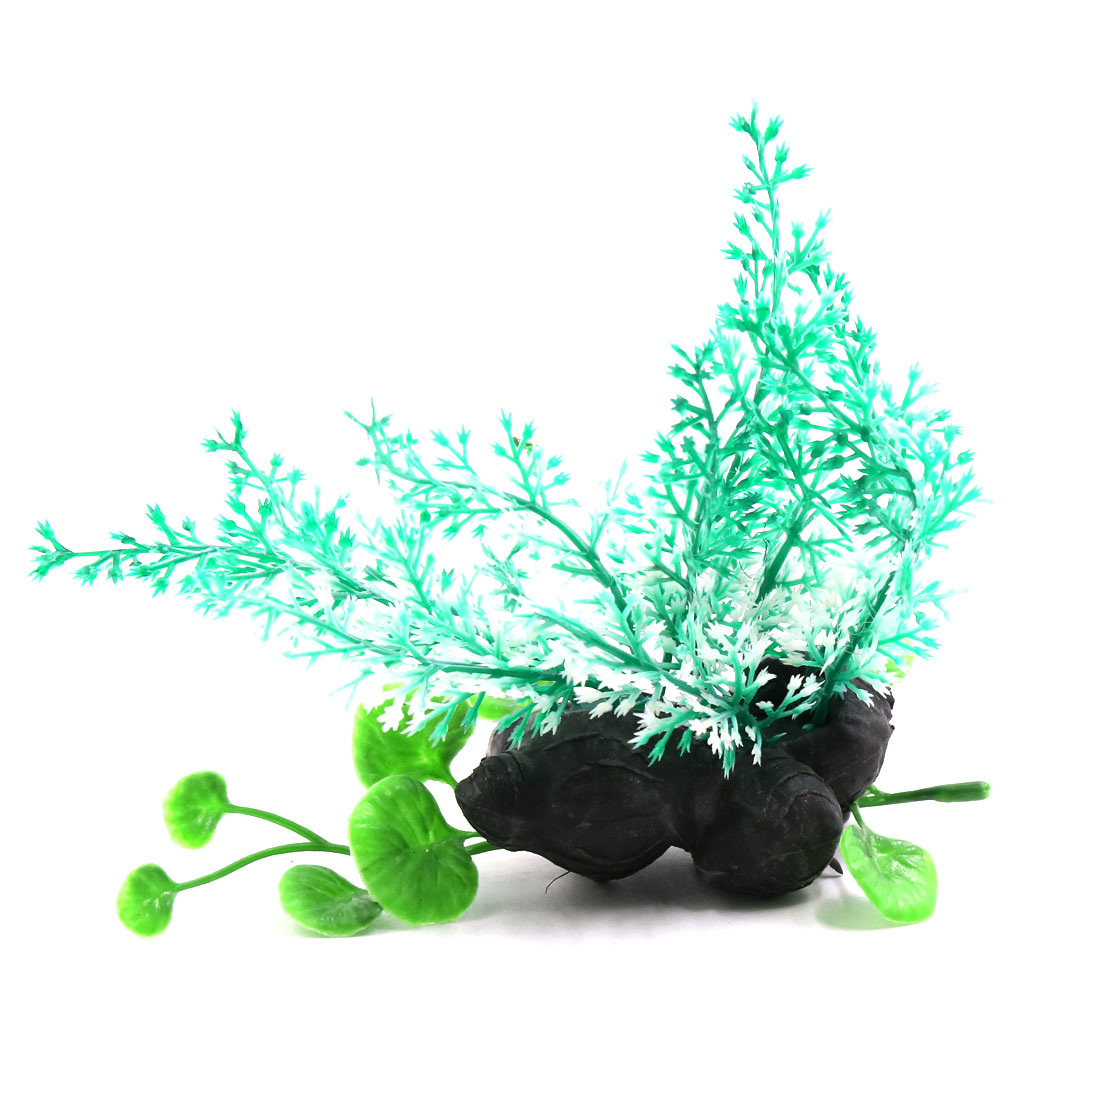 Mint Green Fish Tank Terrarium Plants Ornament for Reptiles w Ceramic Base